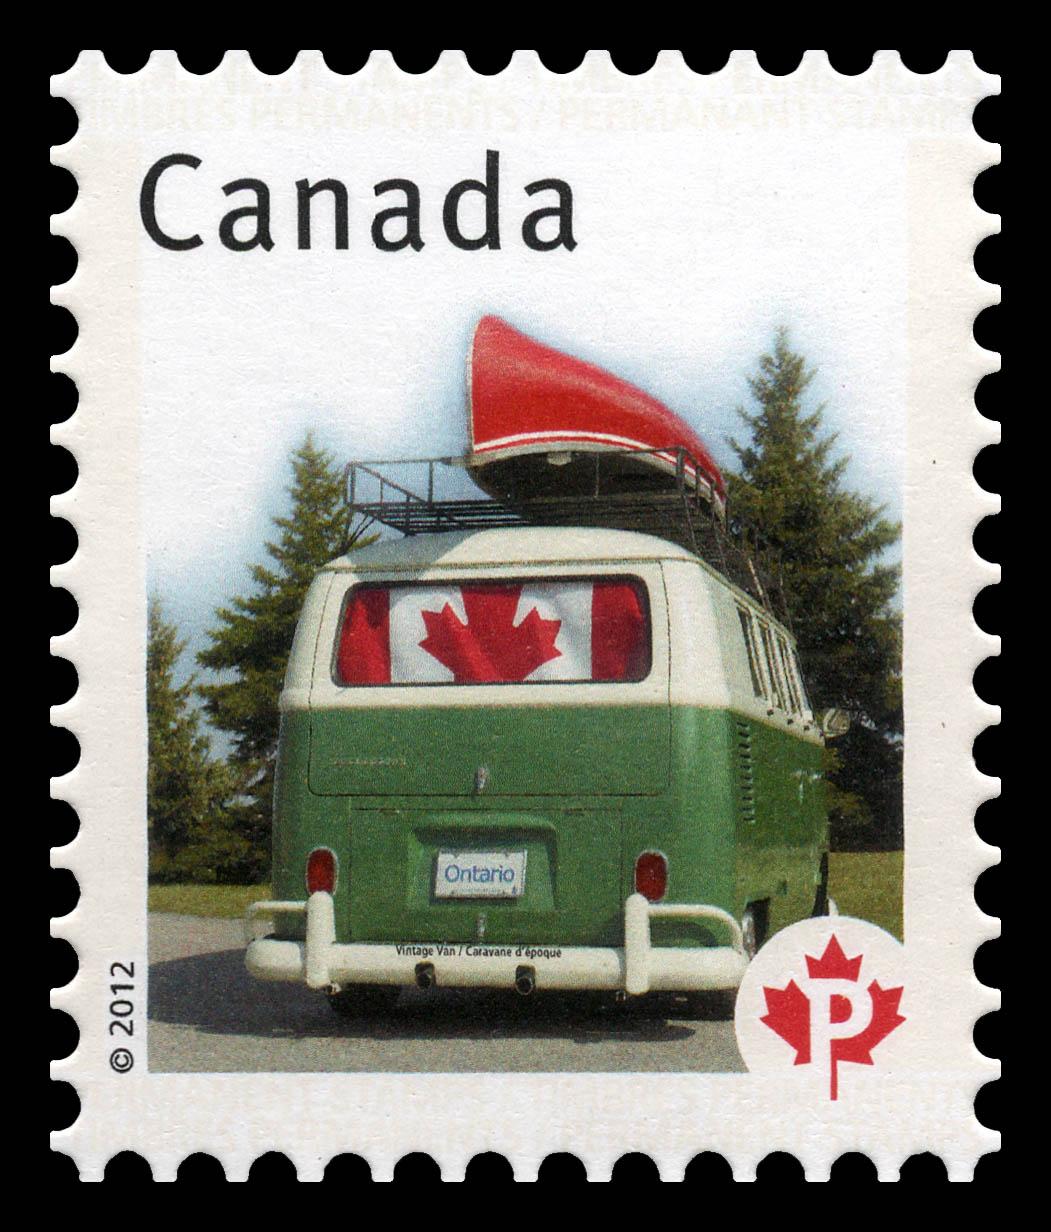 Canada stamp.jpg